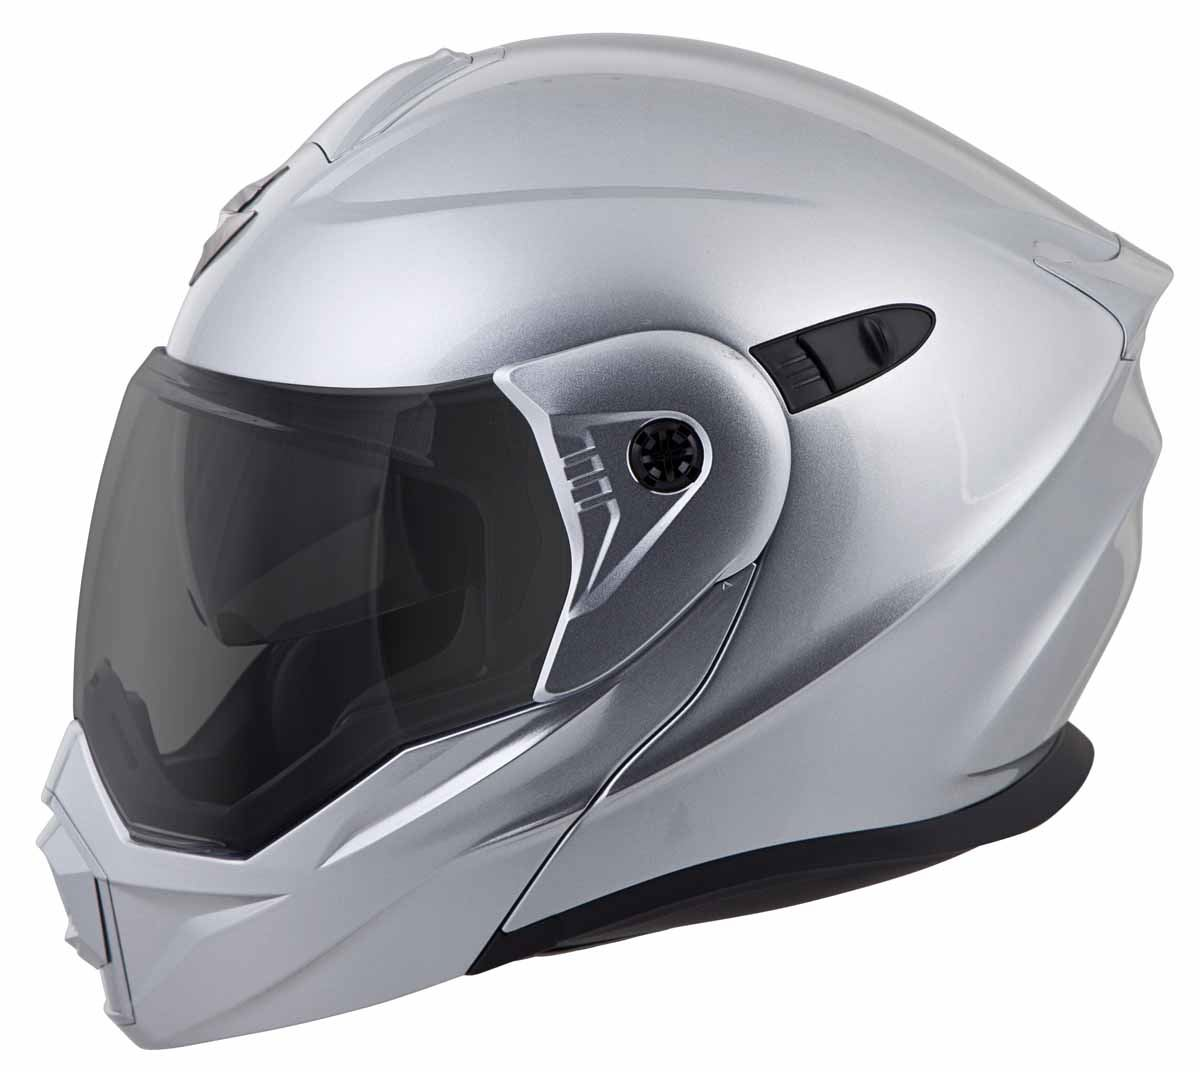 Scorpion-EXO-AT950-Helmet-Flip-Up-Modular-Dual-Sport-Adventure-ADV-DOT-XS-3XL miniature 18